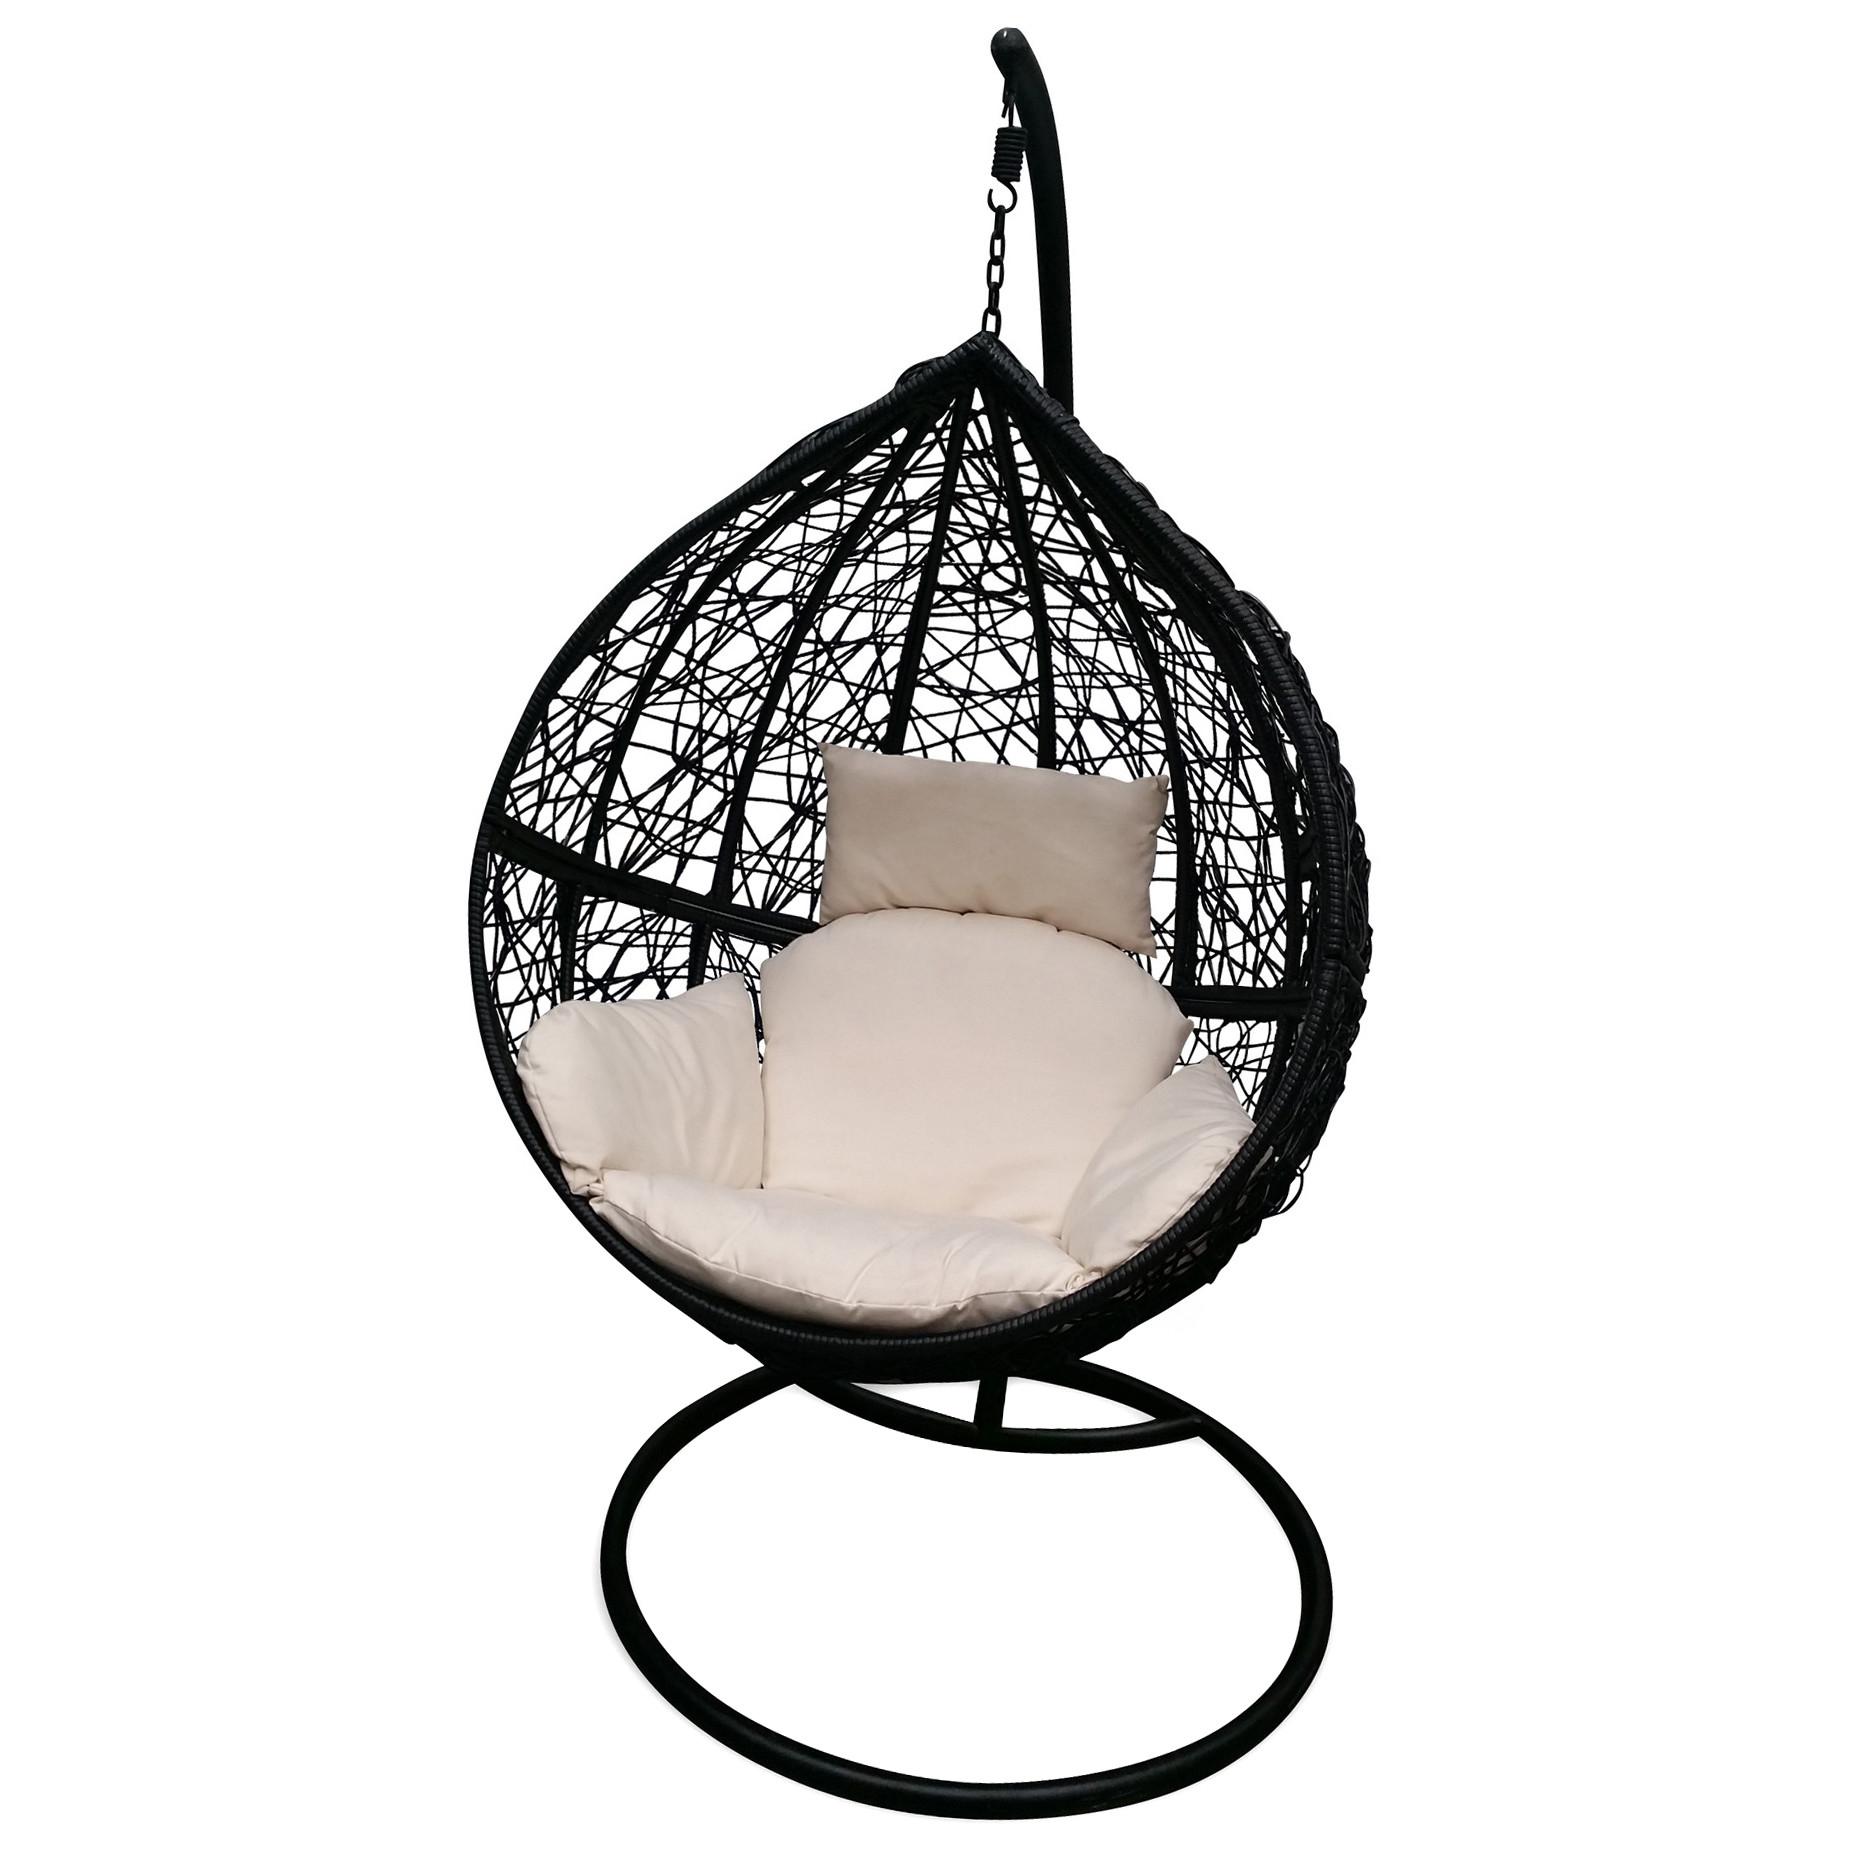 Black Hanging Ball Chair